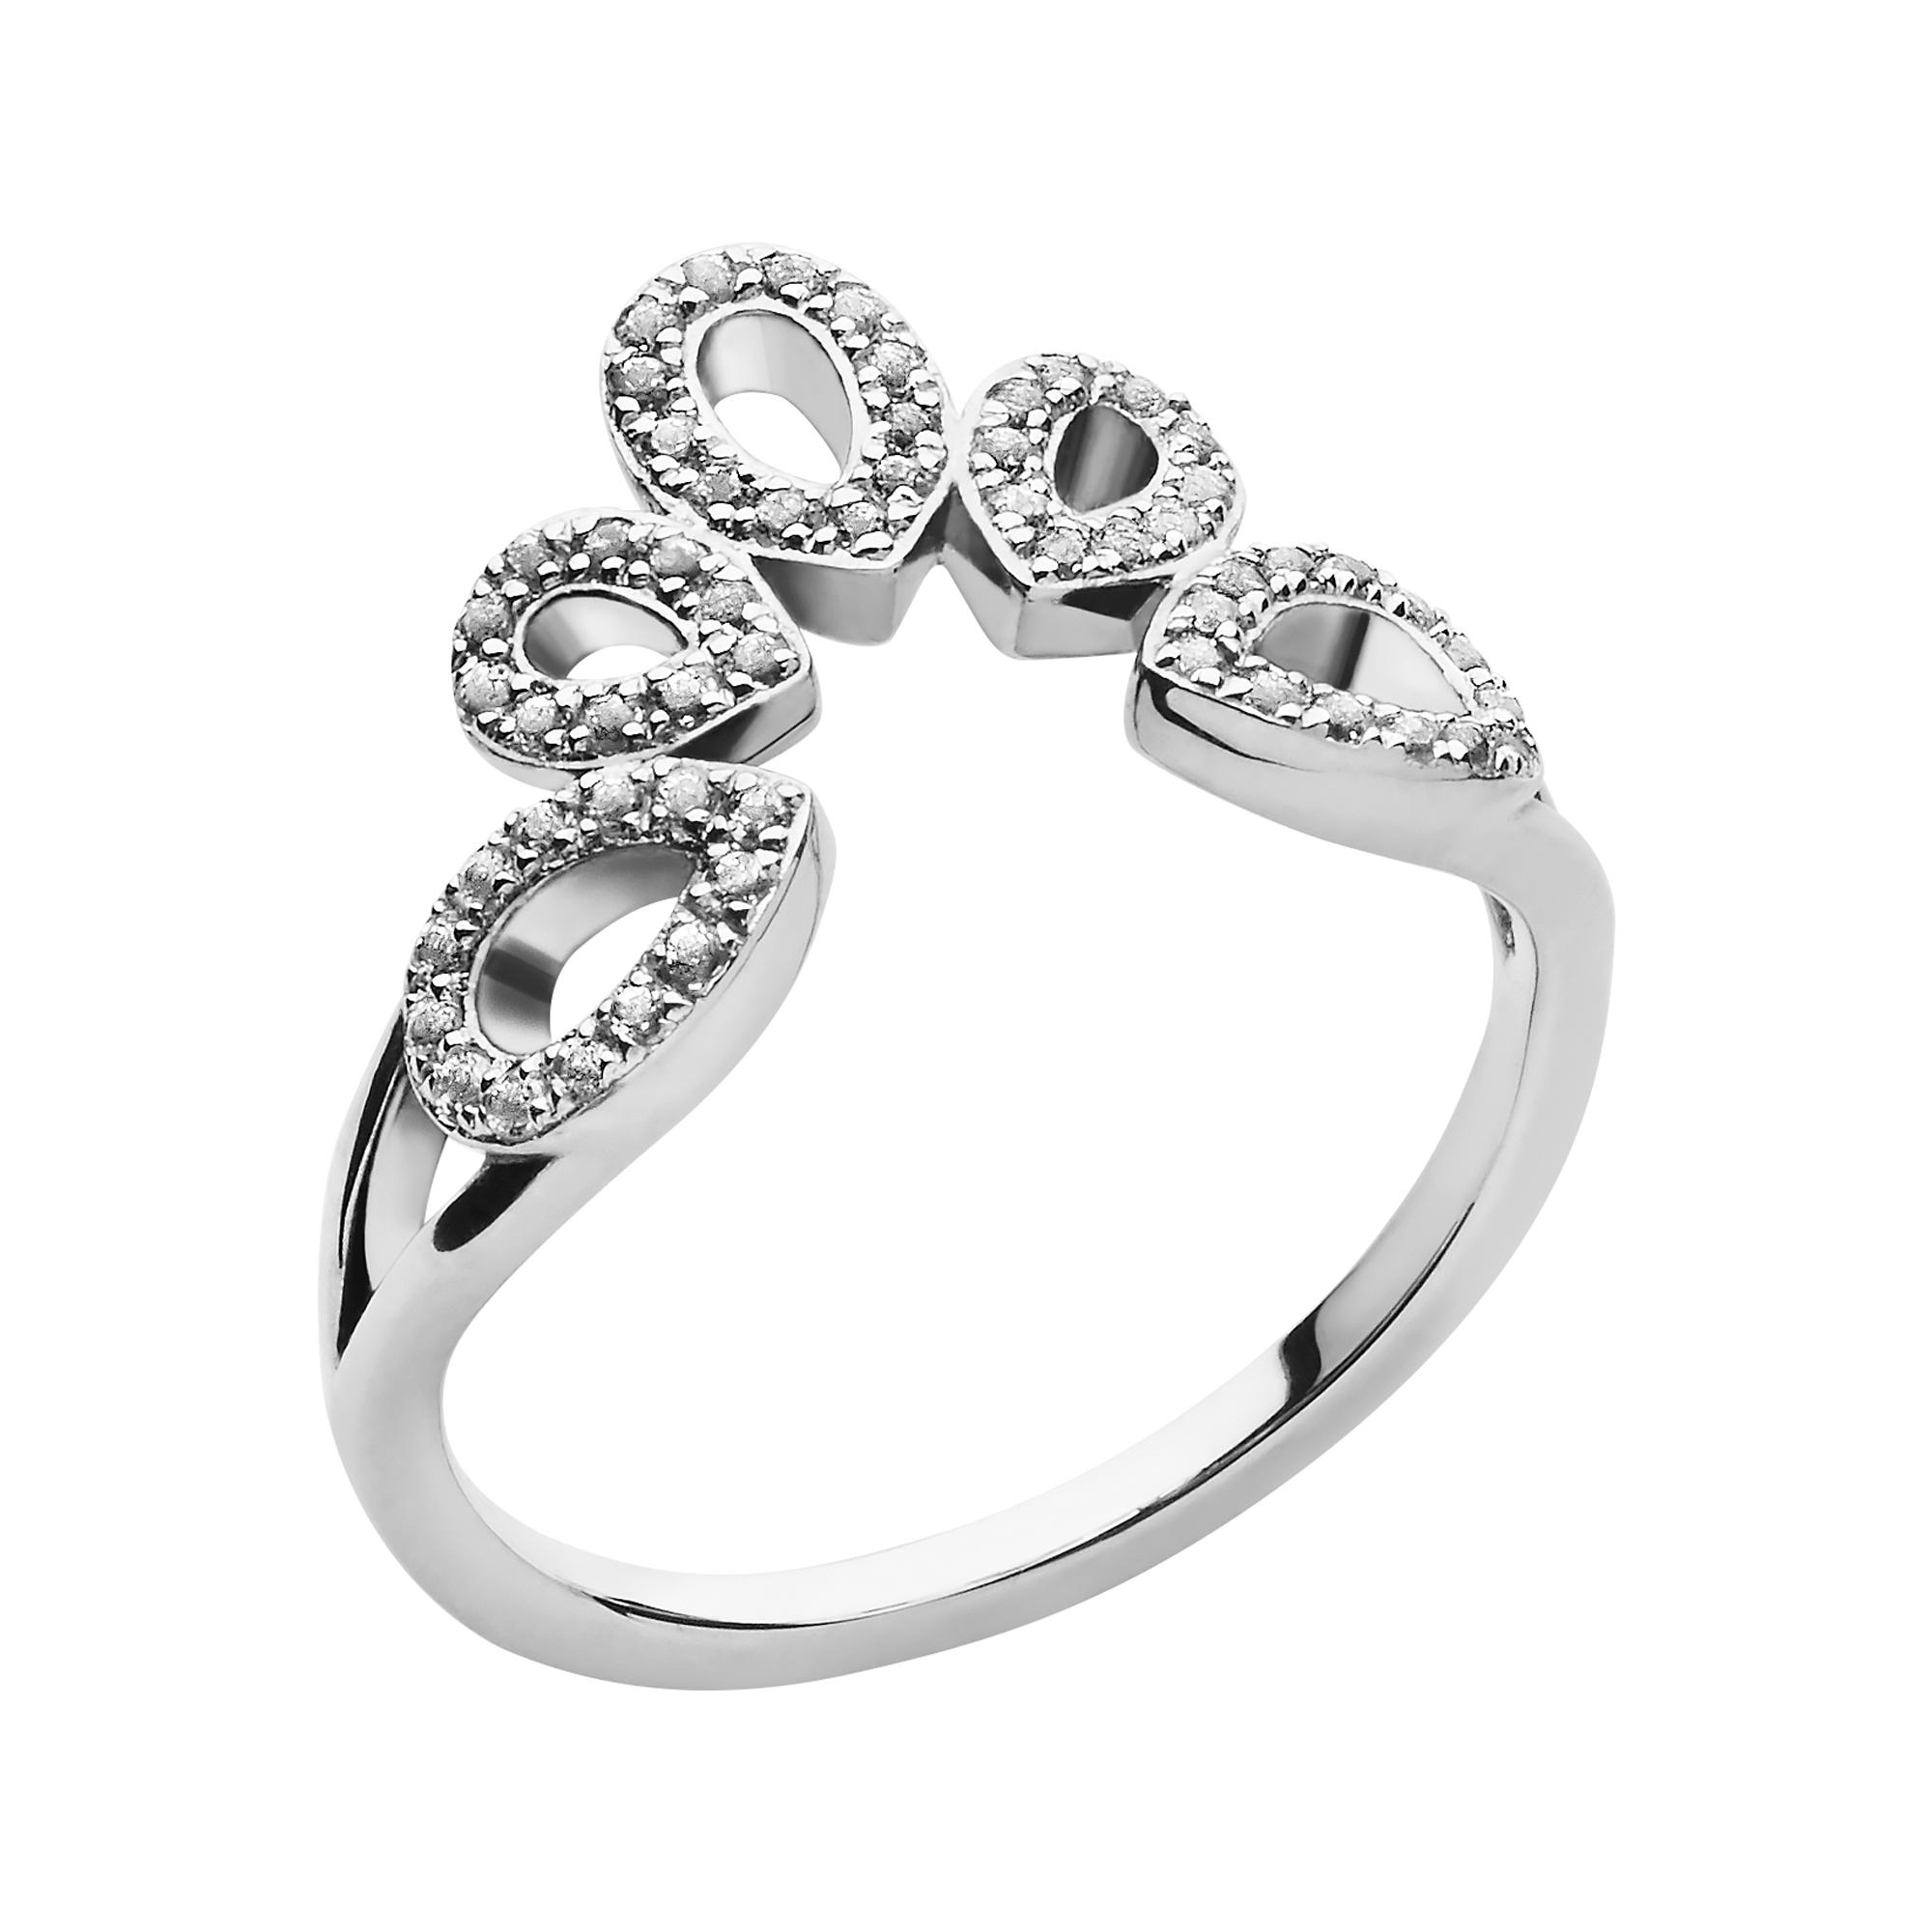 LINKS OF LONDON - Ασημένιο δαχτυλίδι Outlet Peardrops - Μέγεθος 56 γυναικεία αξεσουάρ κοσμήματα δαχτυλίδια